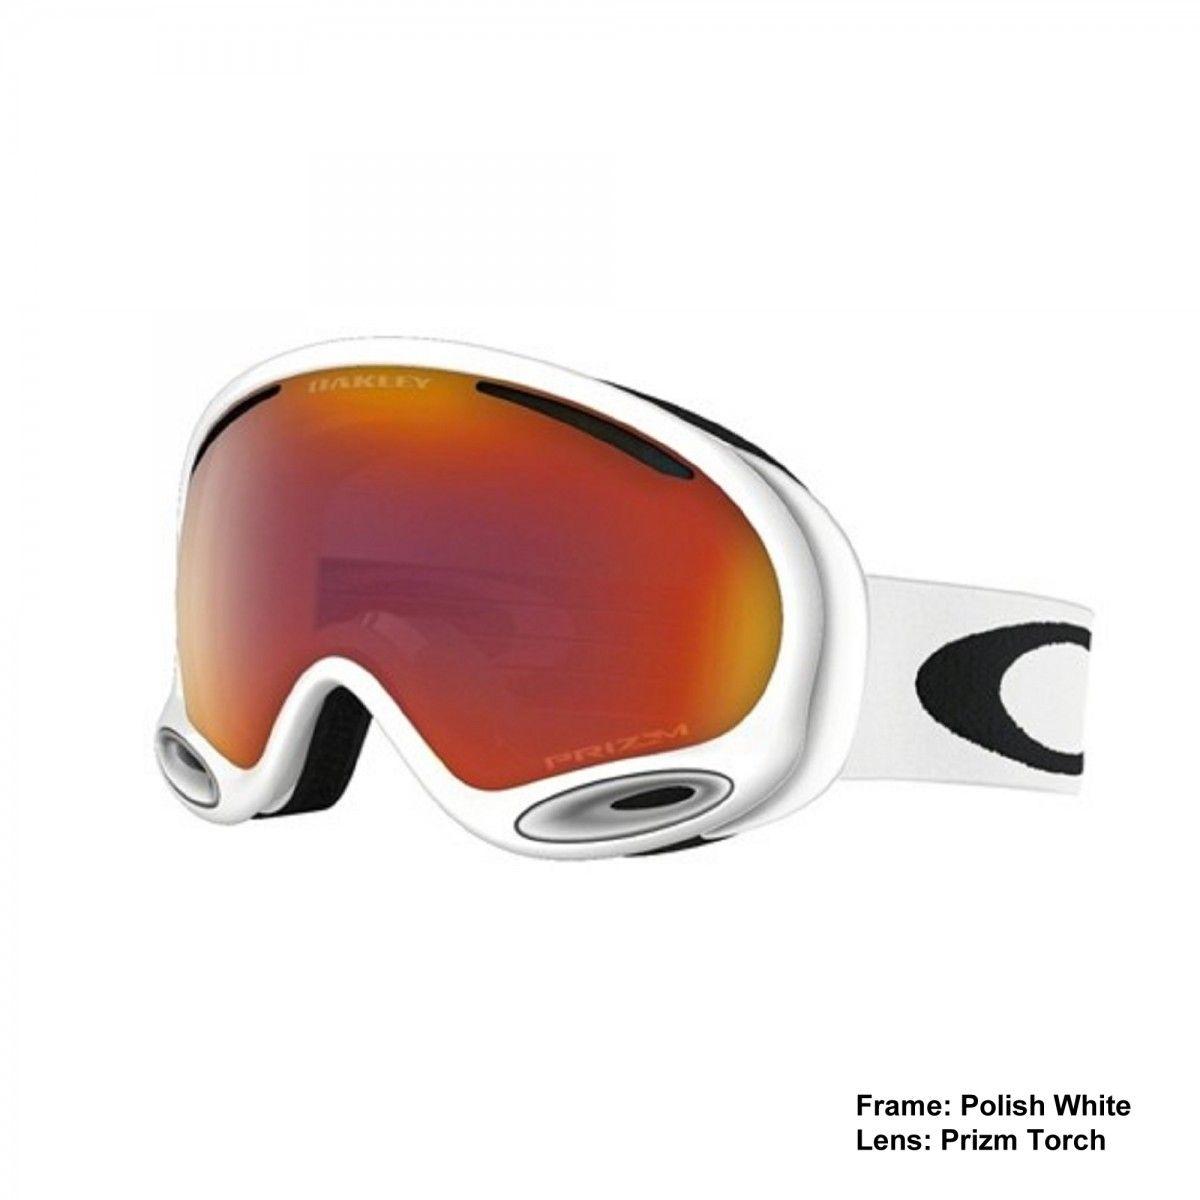 oakley snowboard goggles gps  Oakley A-Frame 2.0 Ski Snowboard Goggles from @Golfskipin